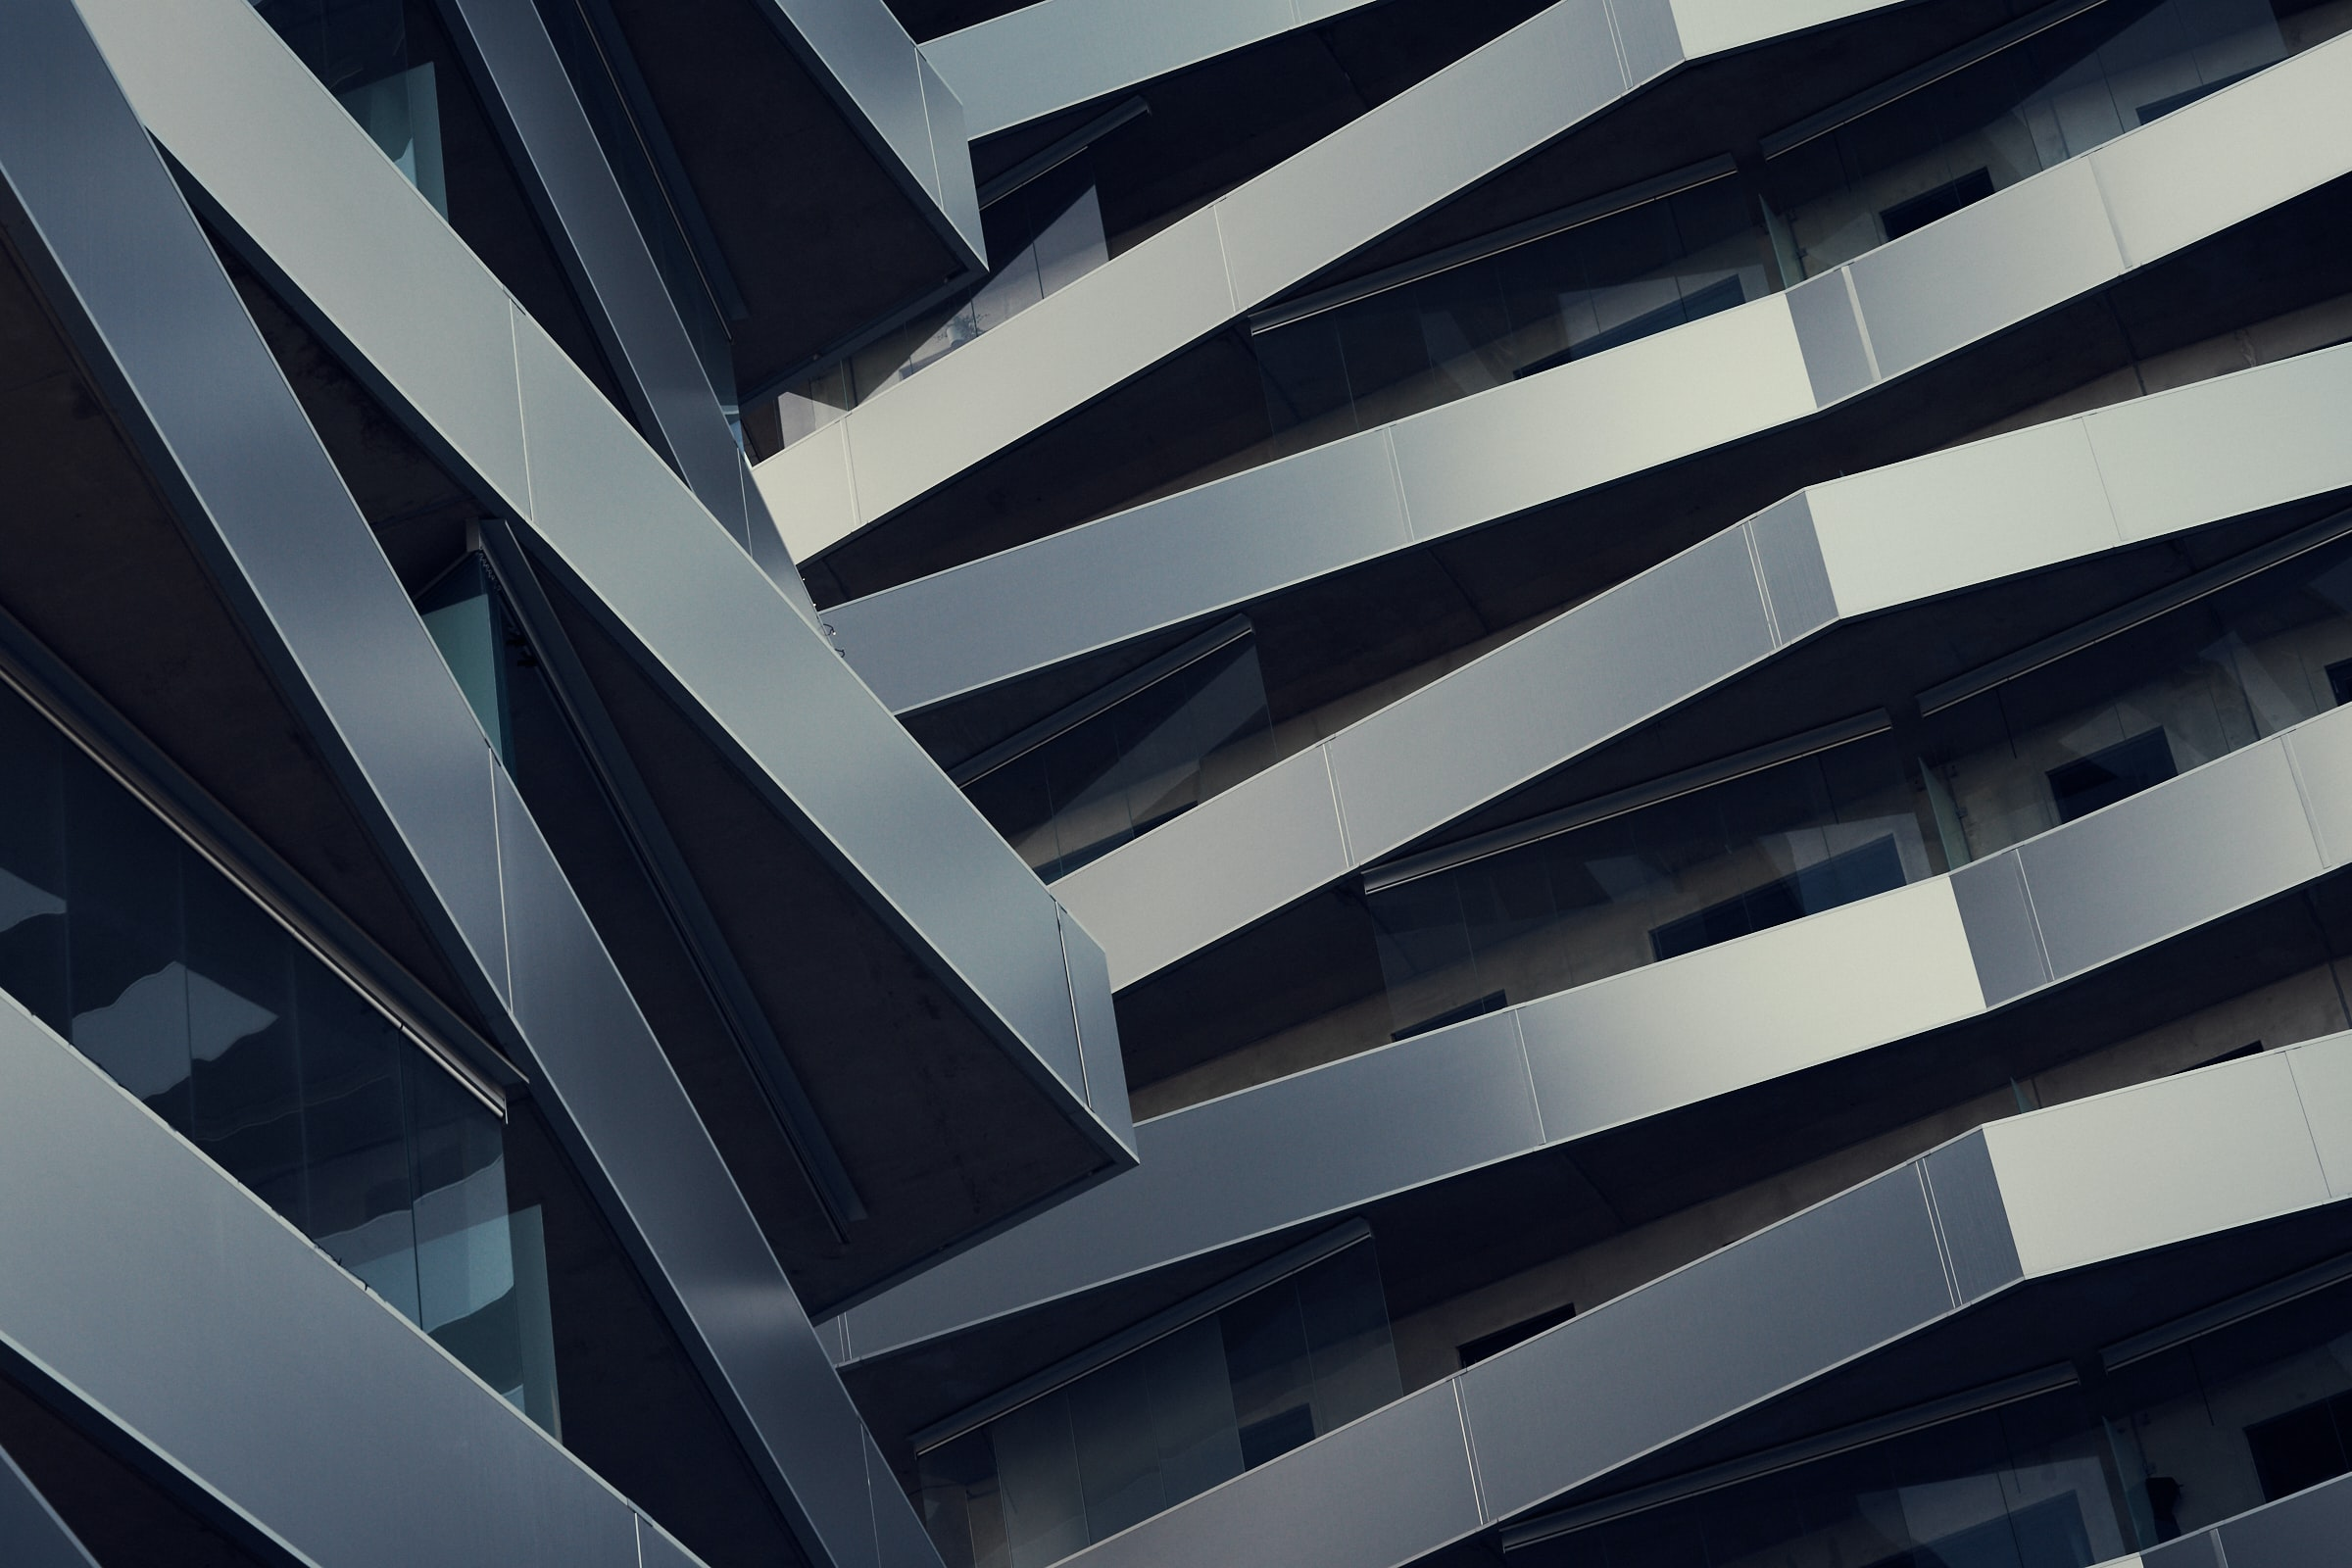 An urban skyscraper building design taken in Tuletorget